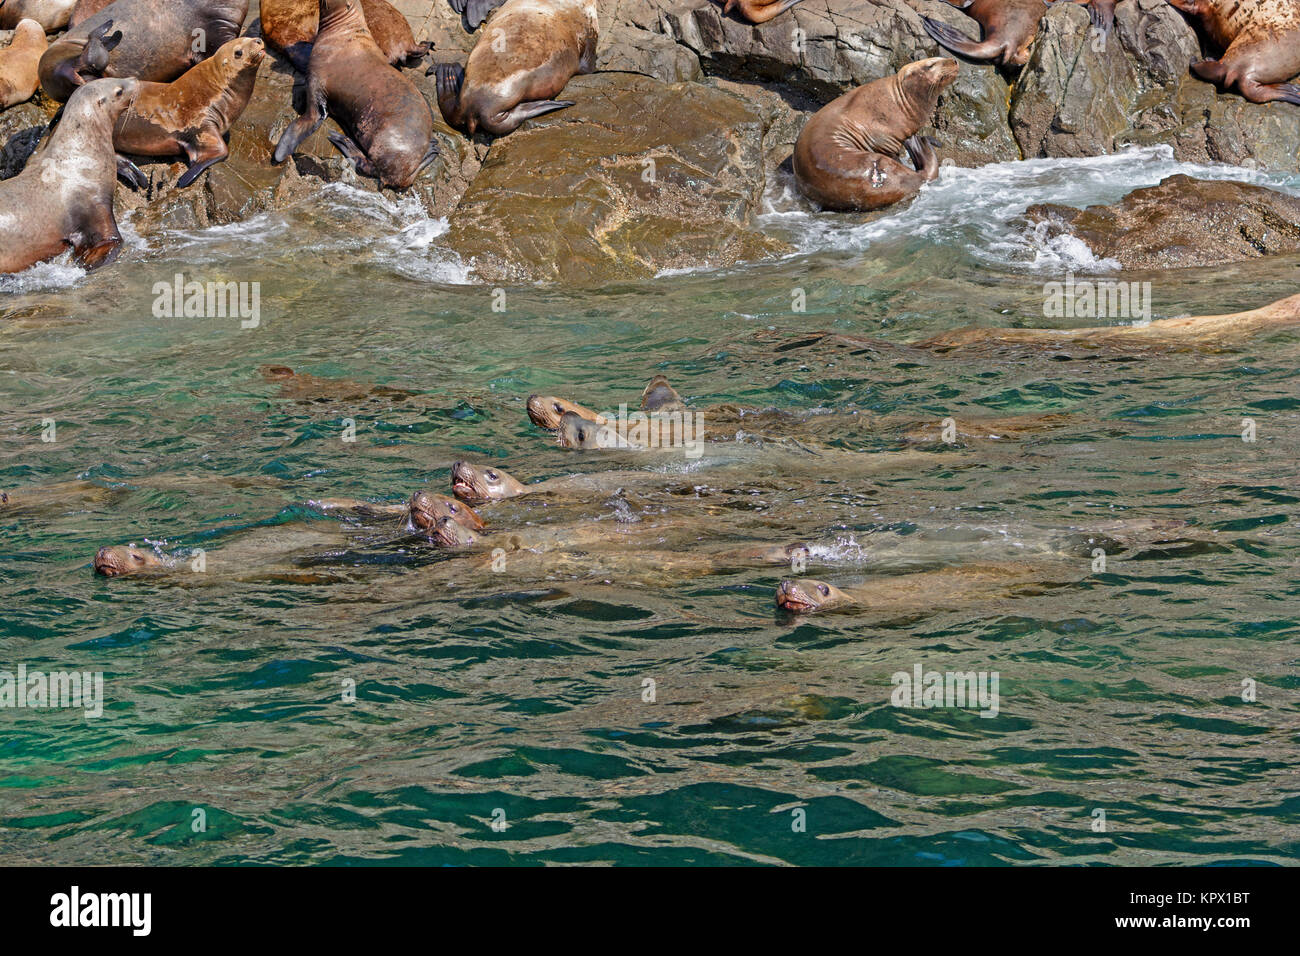 Stellar Sea Lions Swimming along the Shore - Stock Image